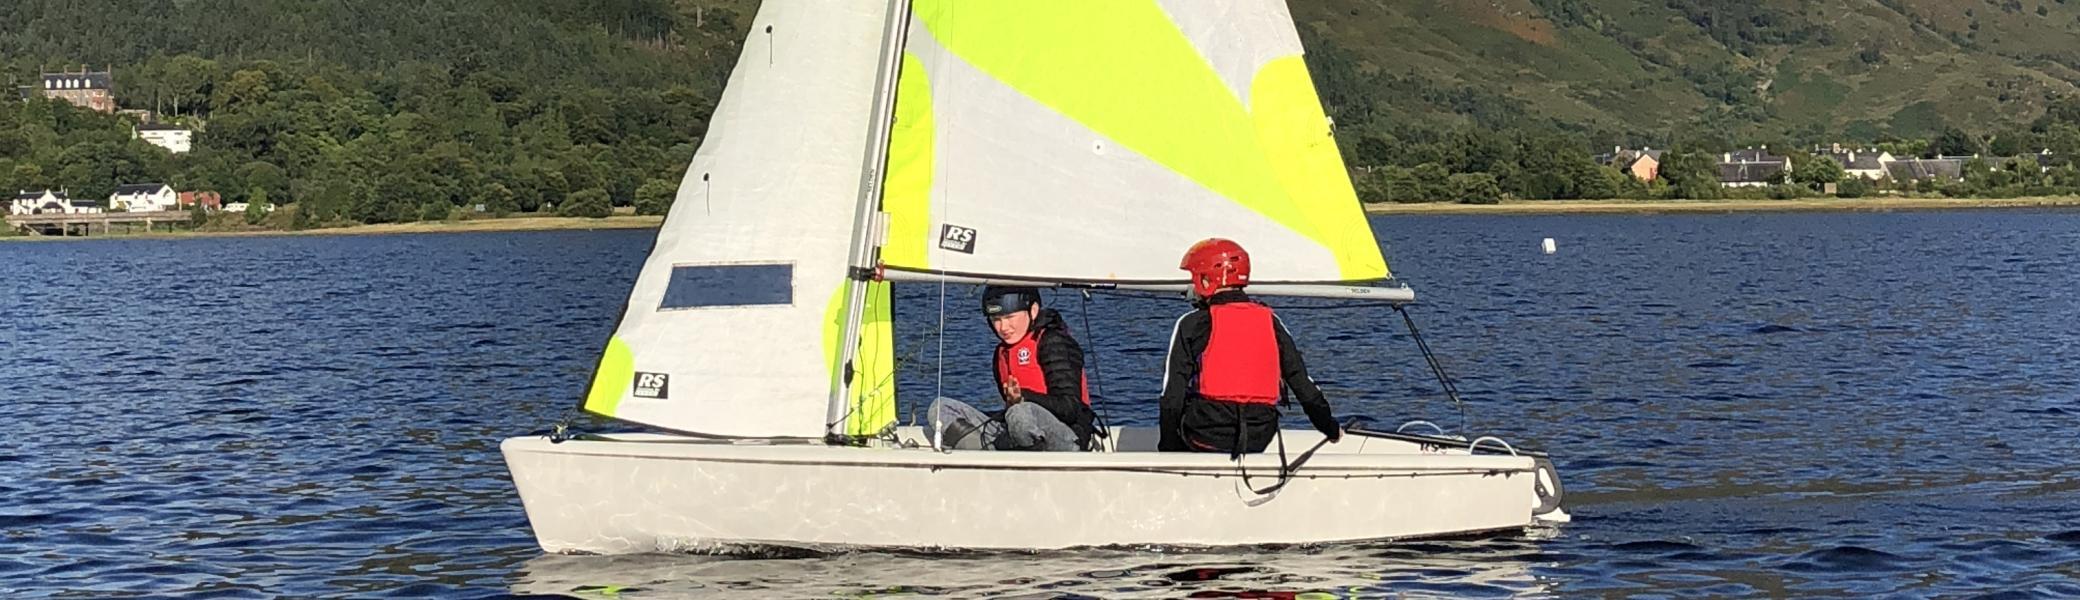 Glencoe Boat Club